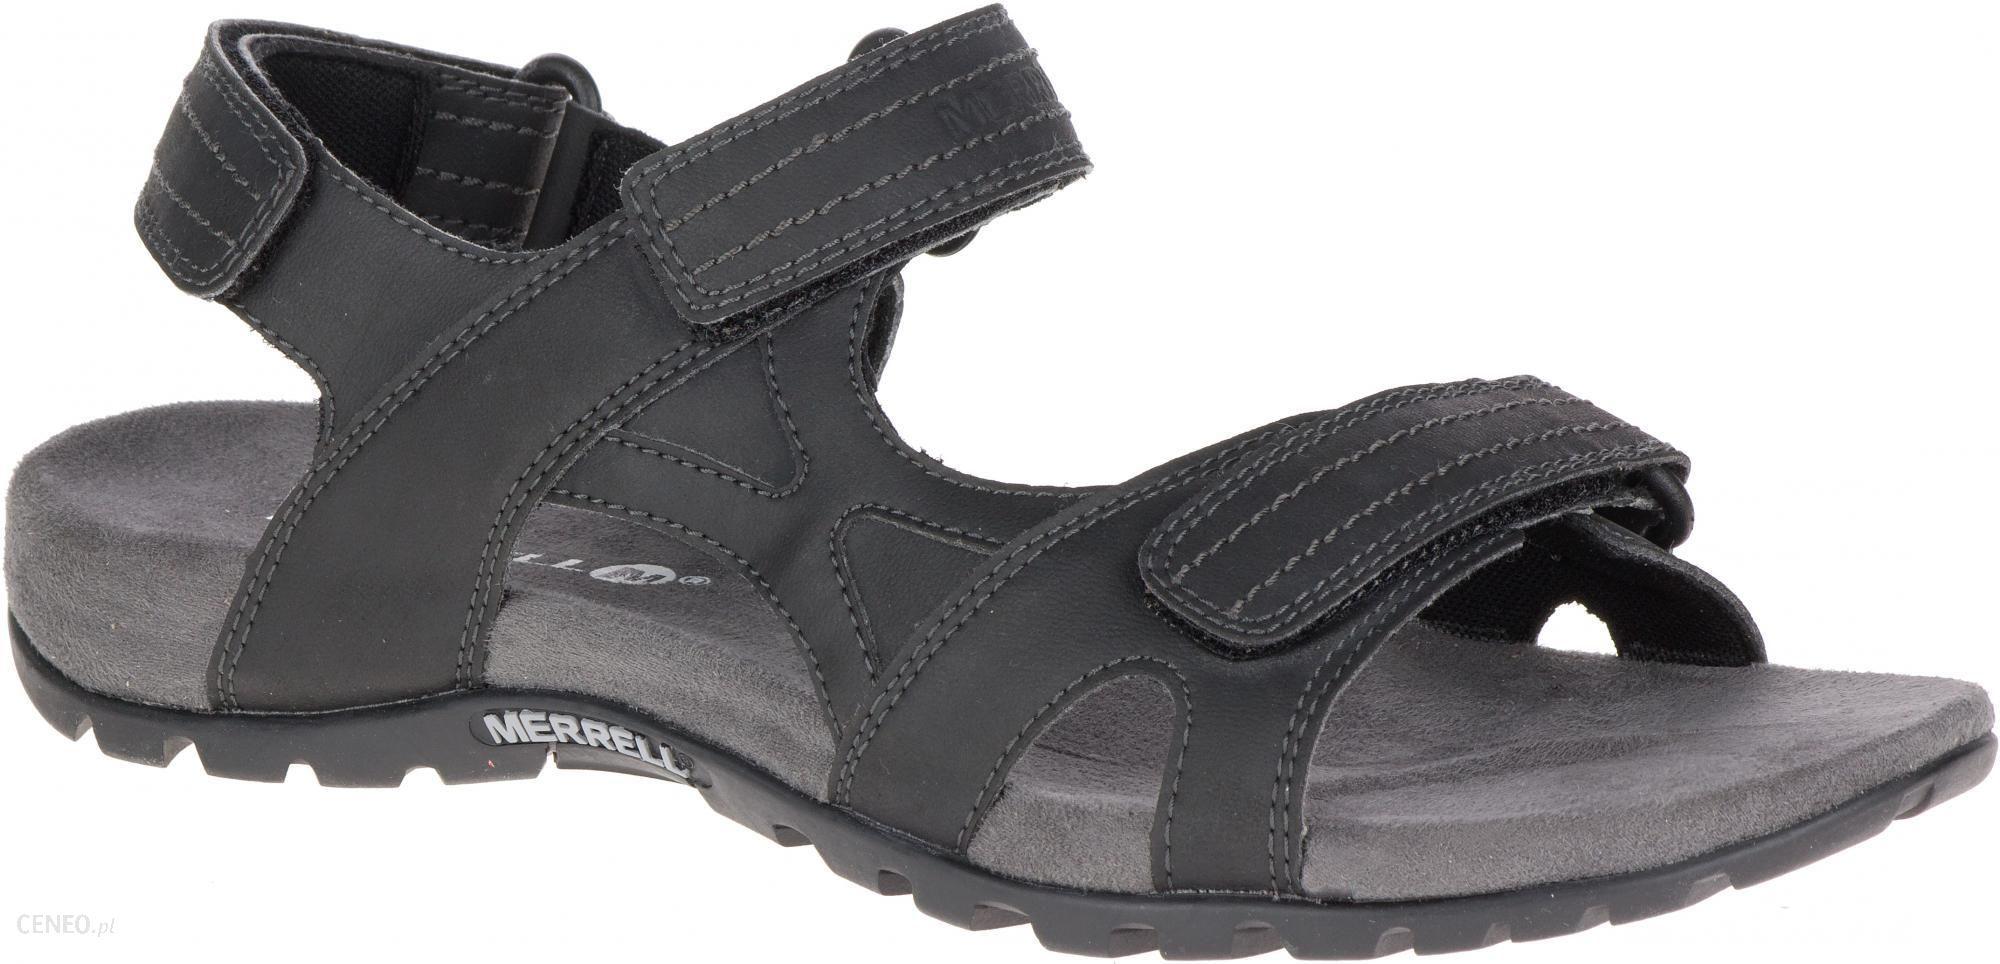 merrell sandały męskie sandspur rift strap black 11